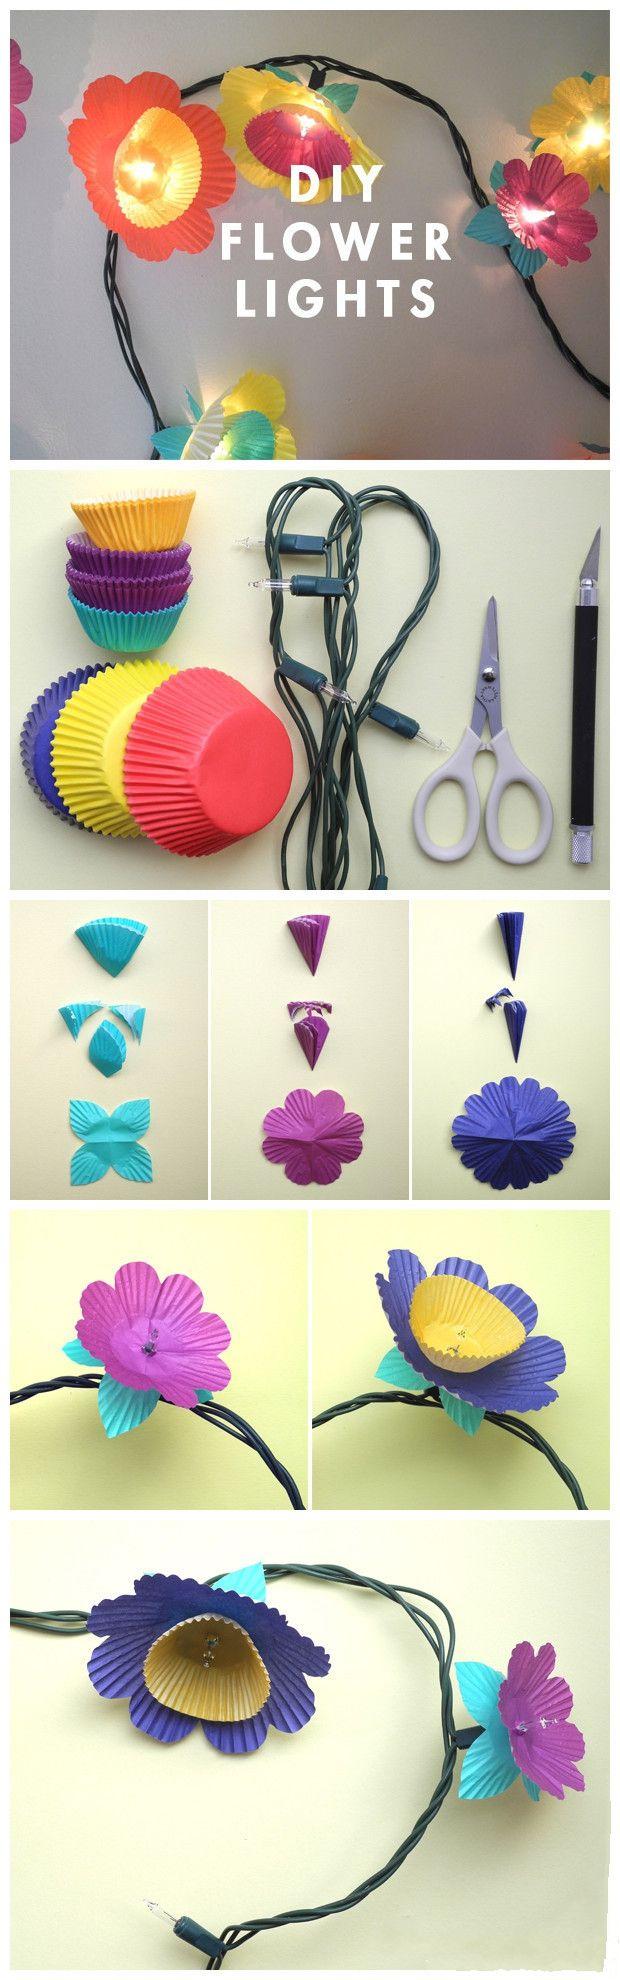 DIY Flower Lights | FabDIY                                                                                                                                                                                 More